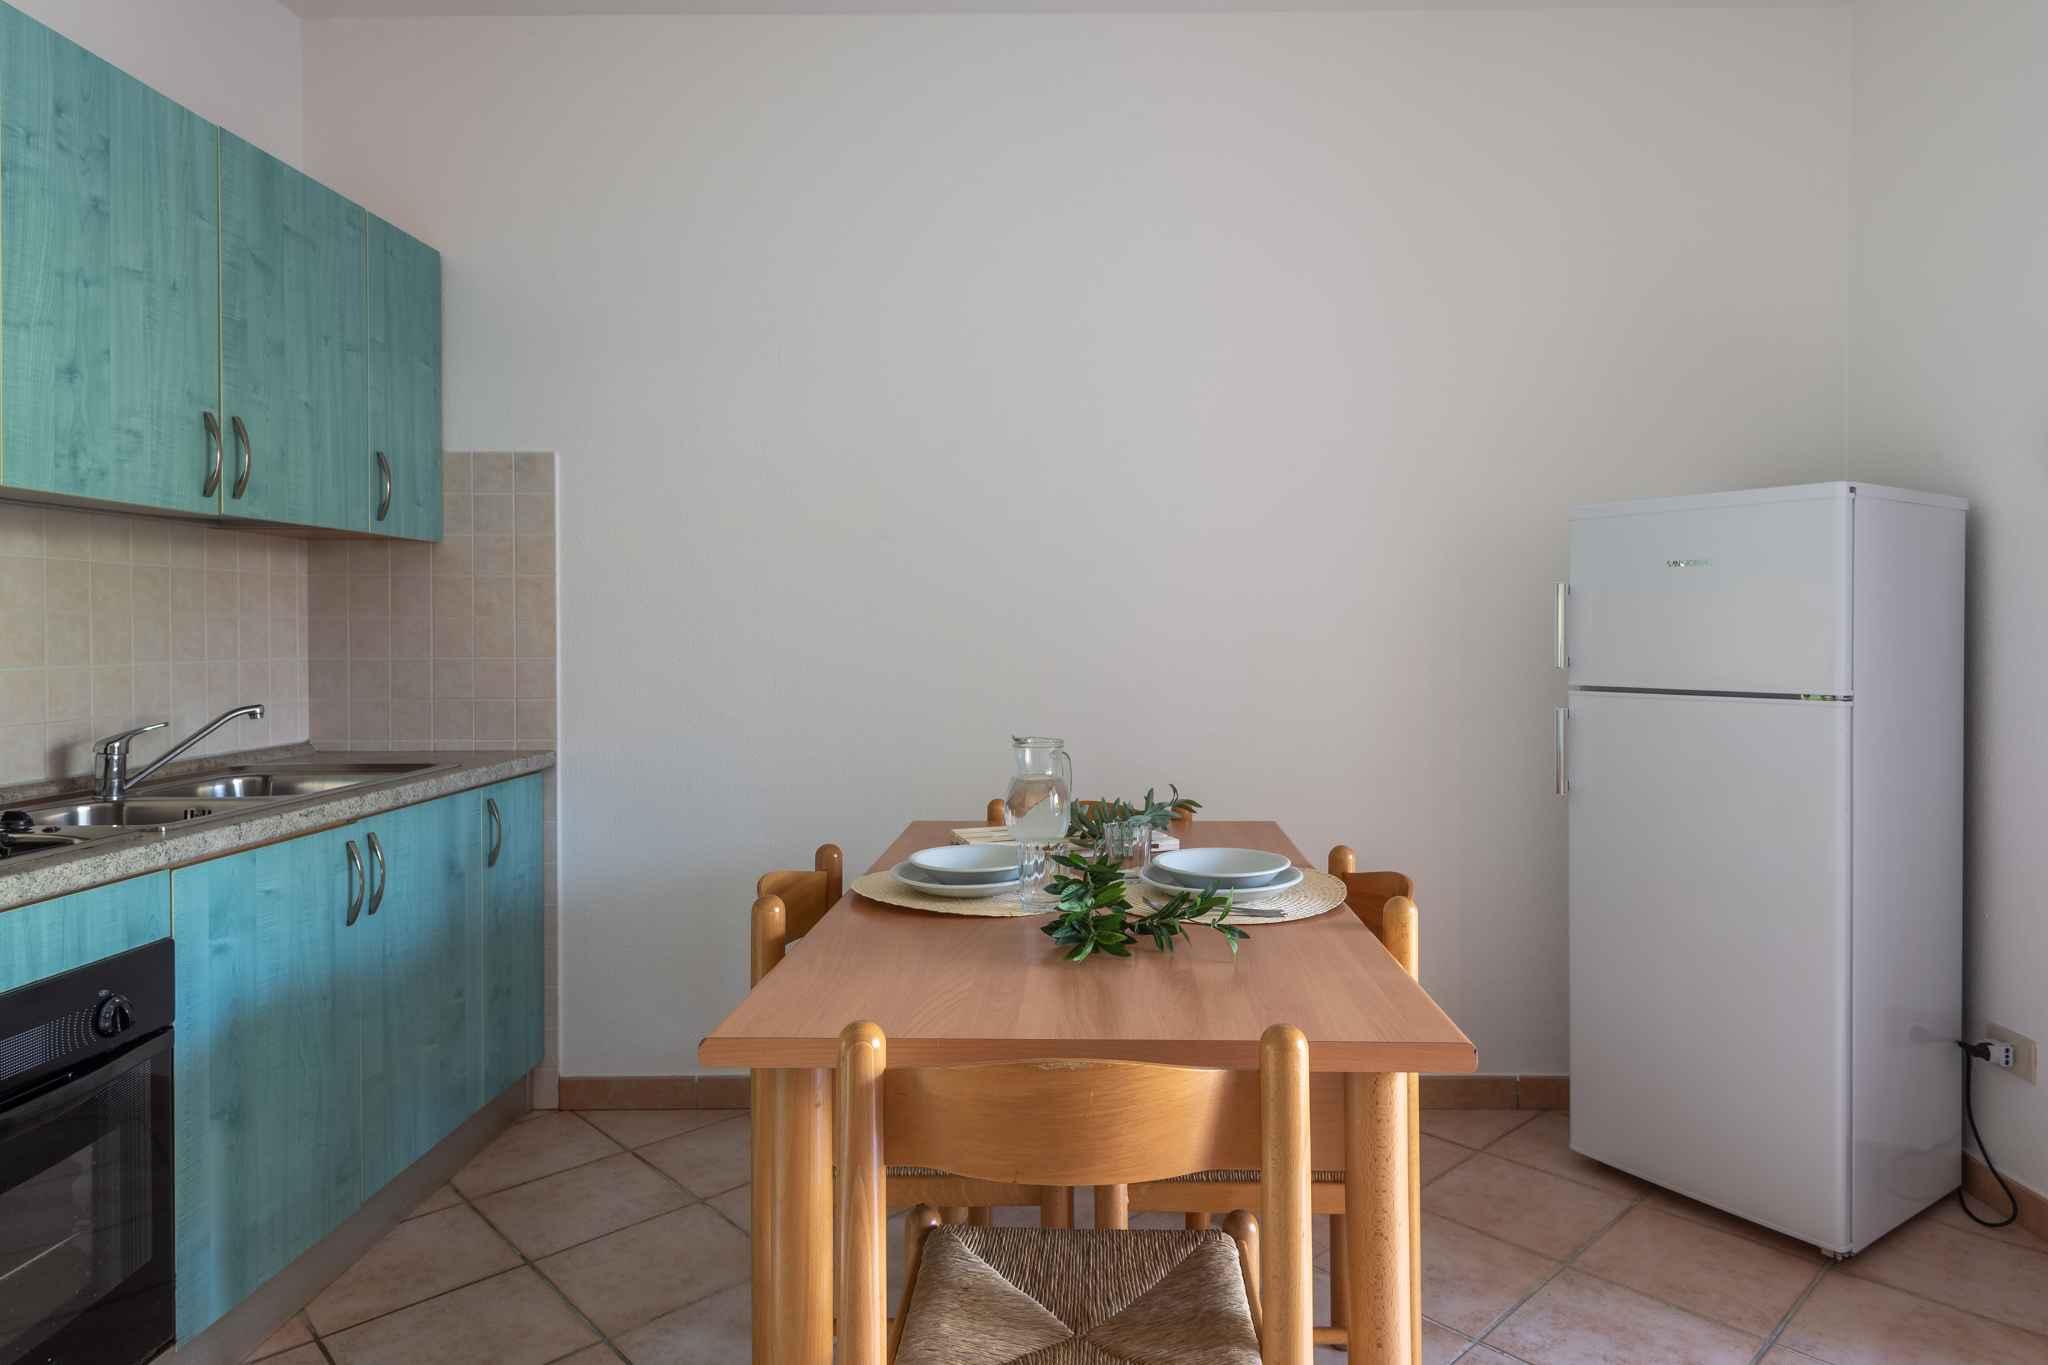 Ferienwohnung Appartamento 4 persone (2853260), Budoni, Olbia-Tempio, Sardinien, Italien, Bild 3